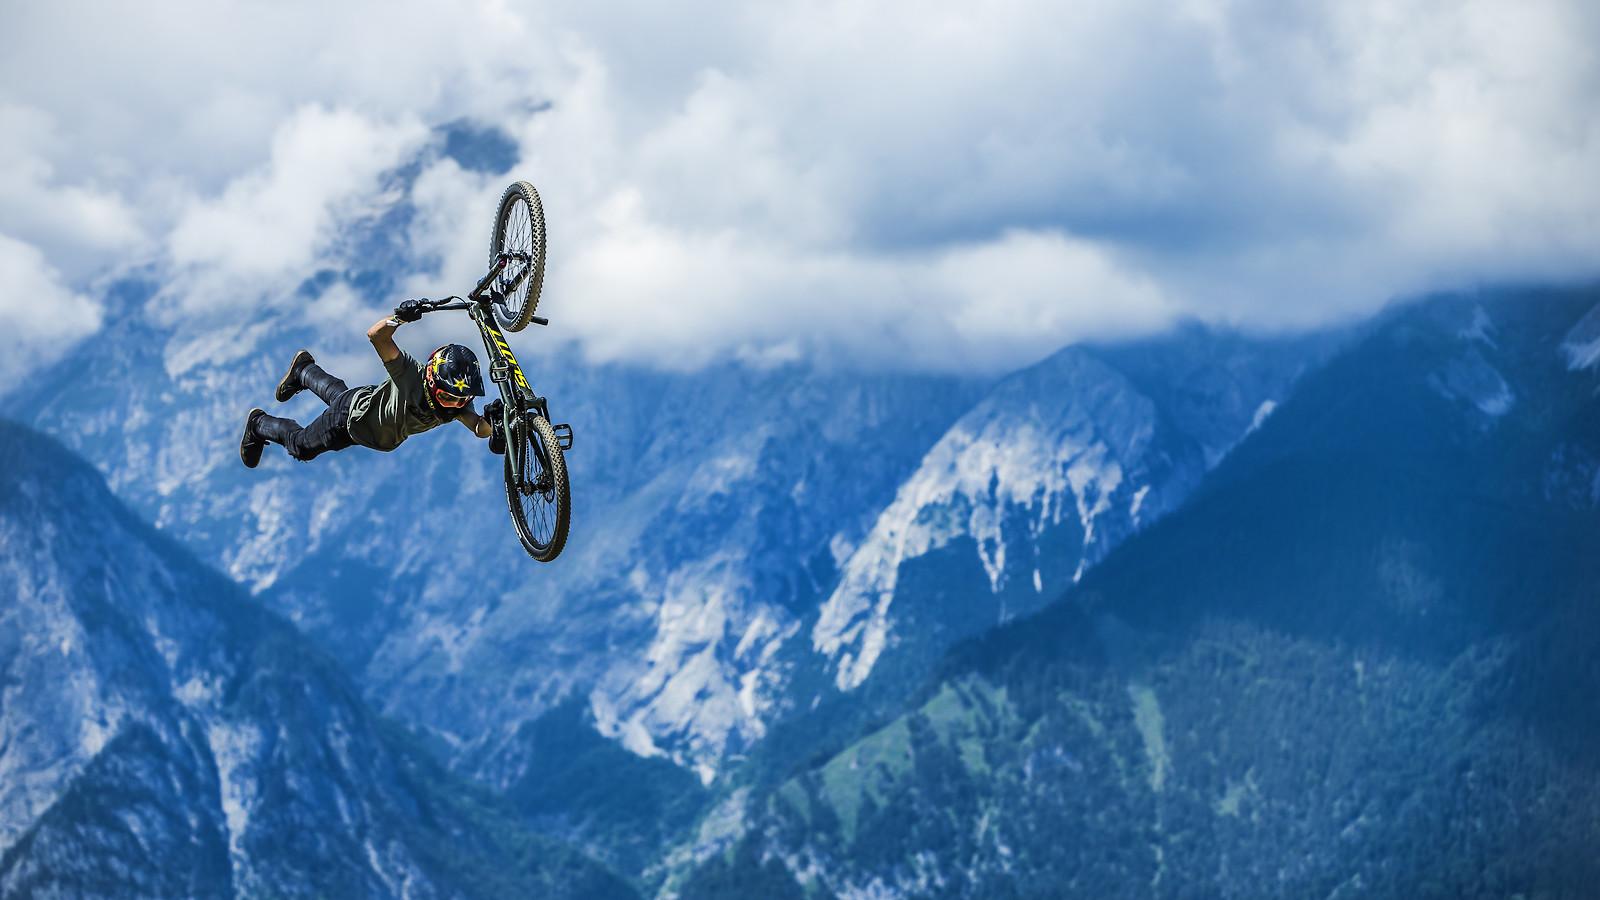 X0R8573 - phunkt.com - Mountain Biking Pictures - Vital MTB